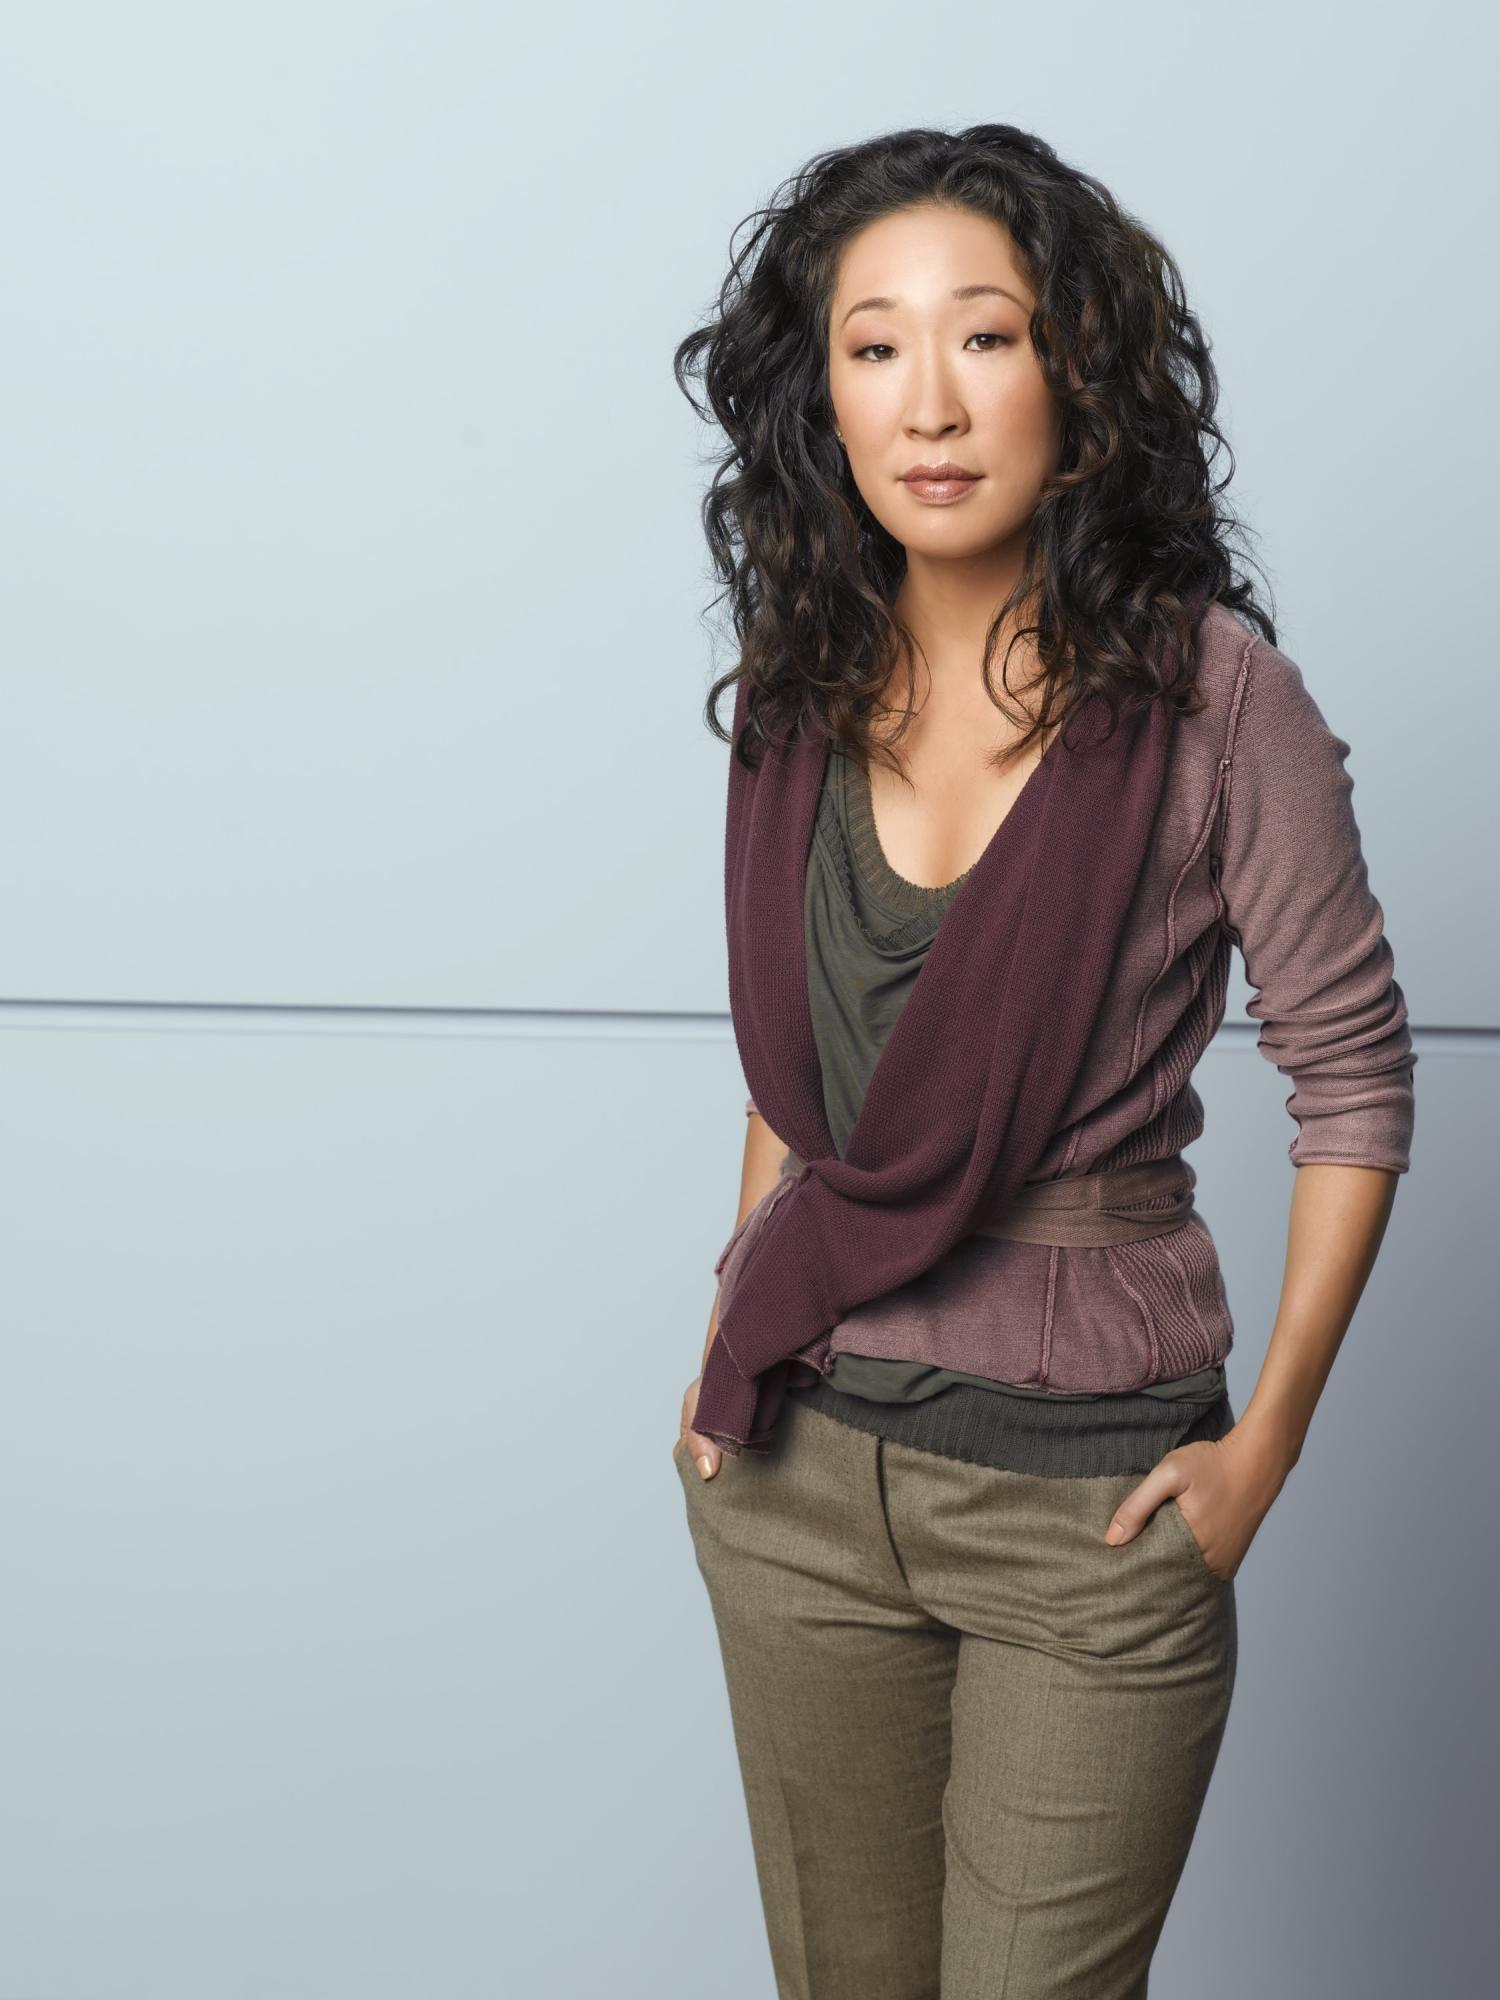 Dr. Christina Yang Odyssey Articles Sandra Cristina Greys Anatomy